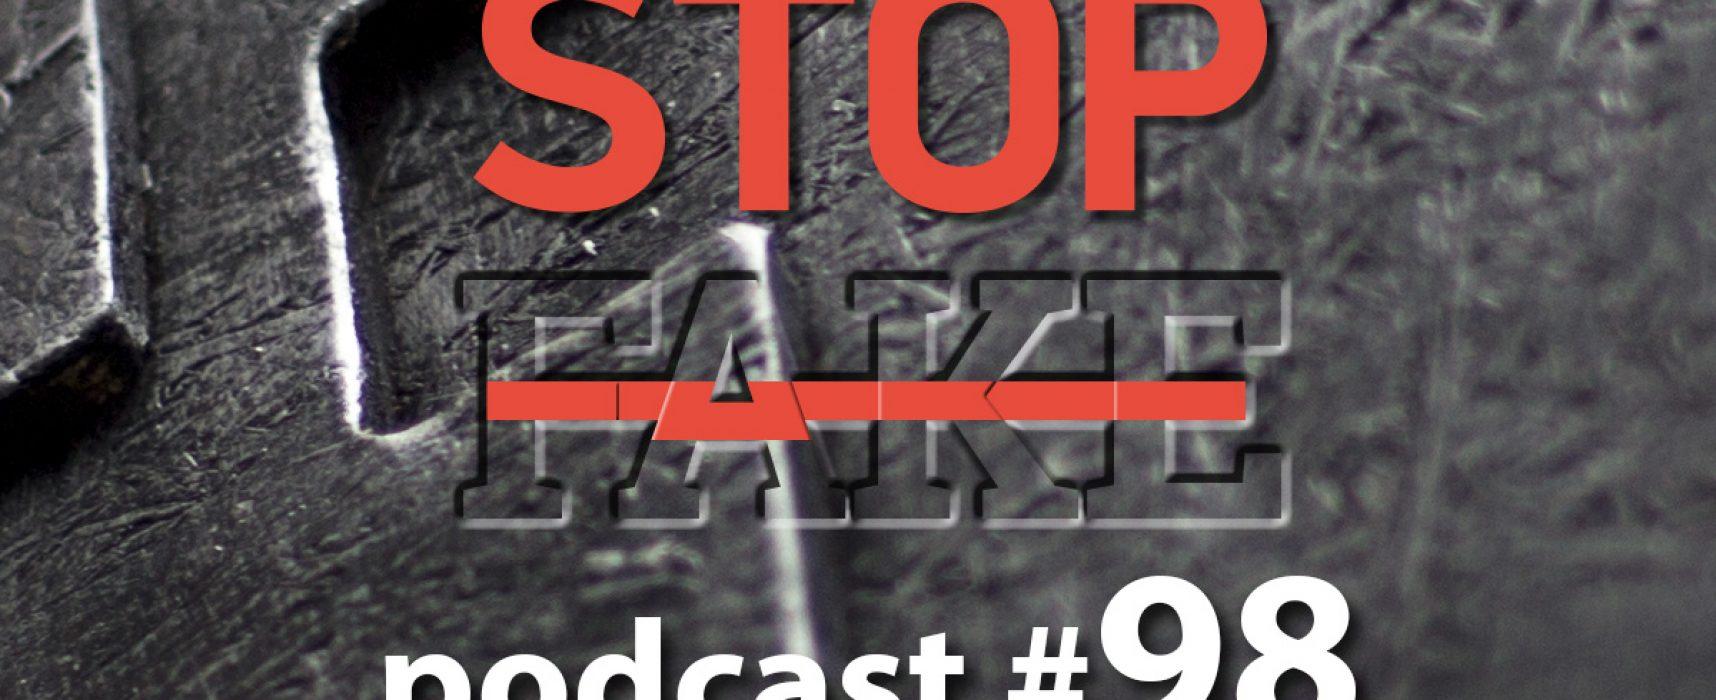 StopFake podcast #98